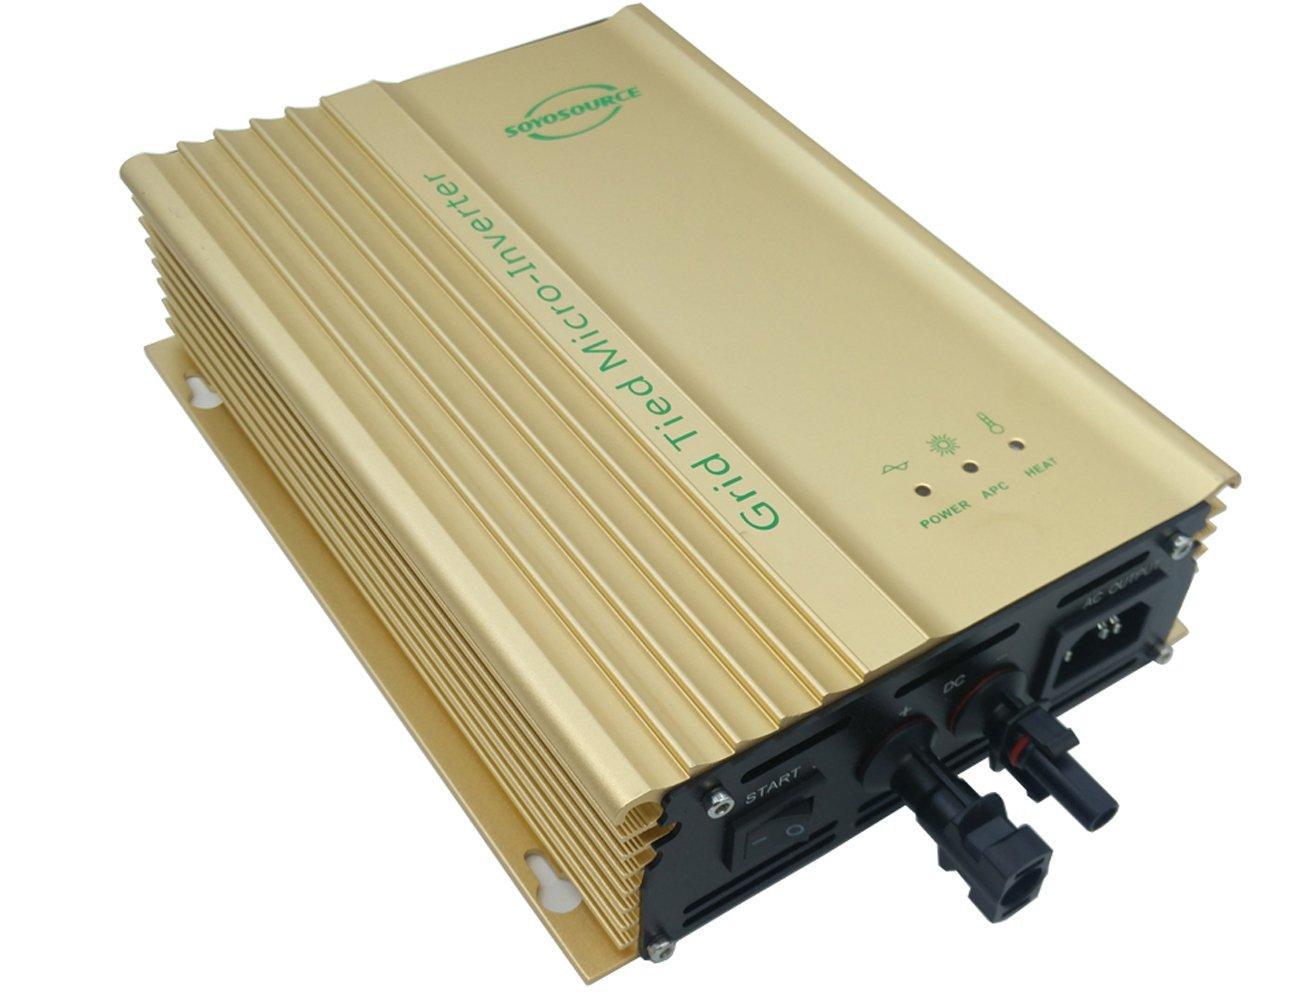 SOYOSOURCE 500W 12v grid tie inverter for solar panels Voc-Input:16V-28V, mppt voltage 11v-22v dc 110V60HZ AC output for 12v battery Solar Inverter pure sine wave (500W PV-INPUT:16V-28V)